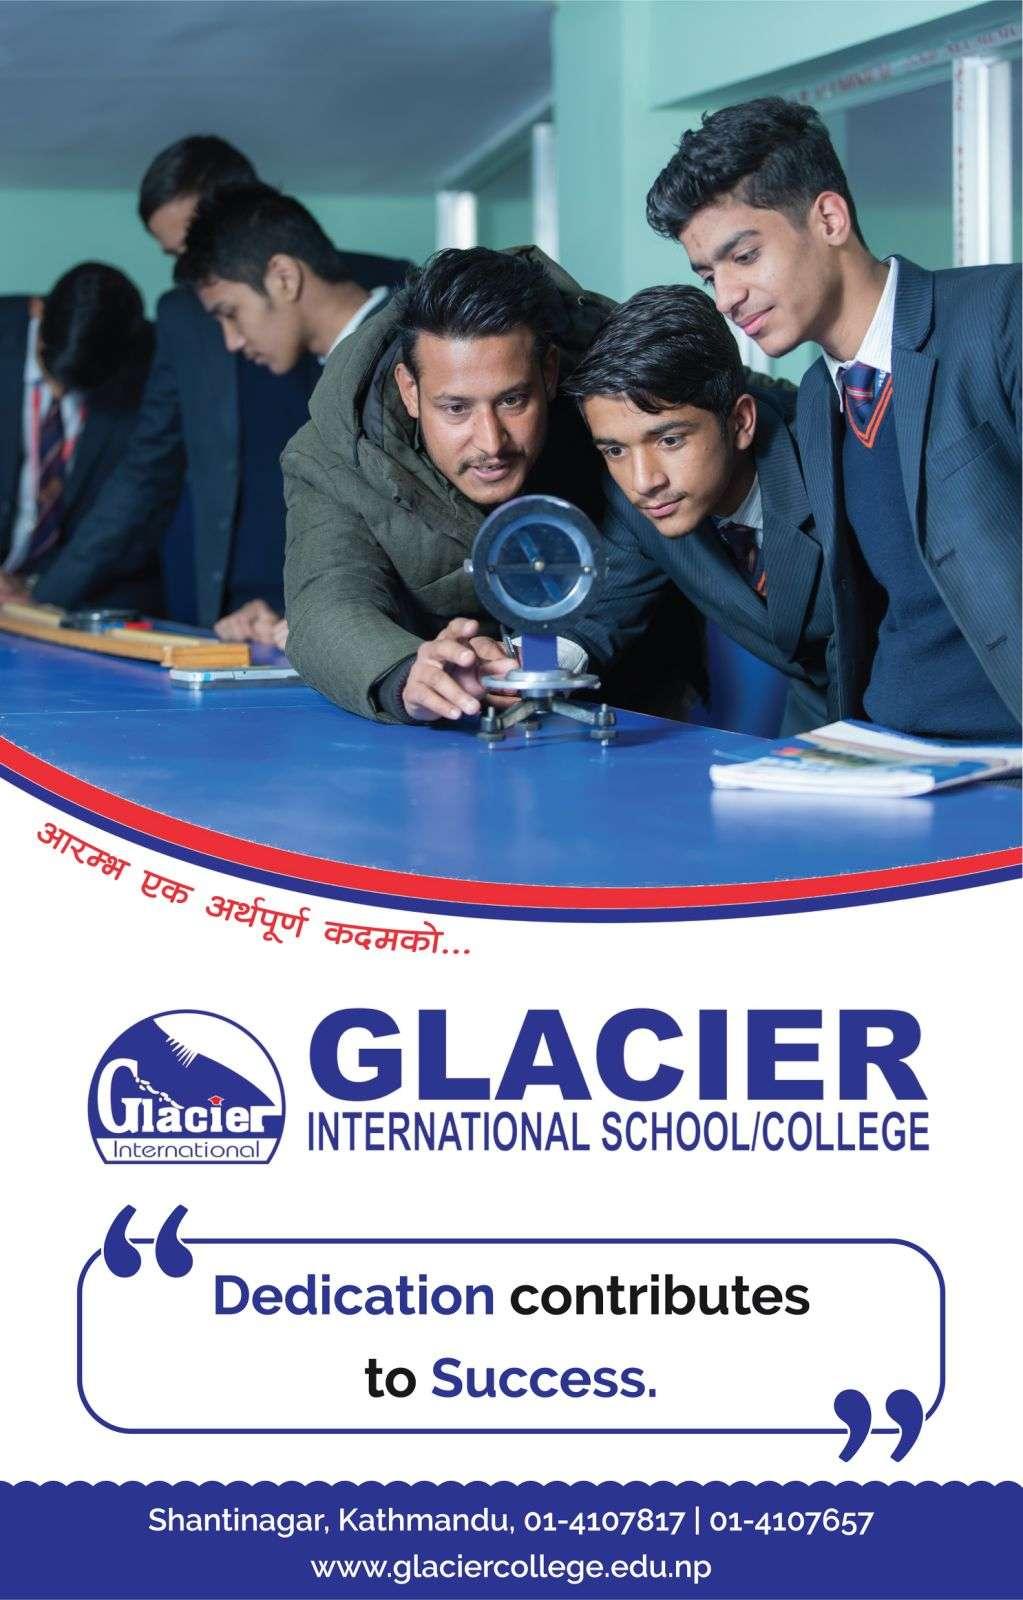 Glacier International School/College